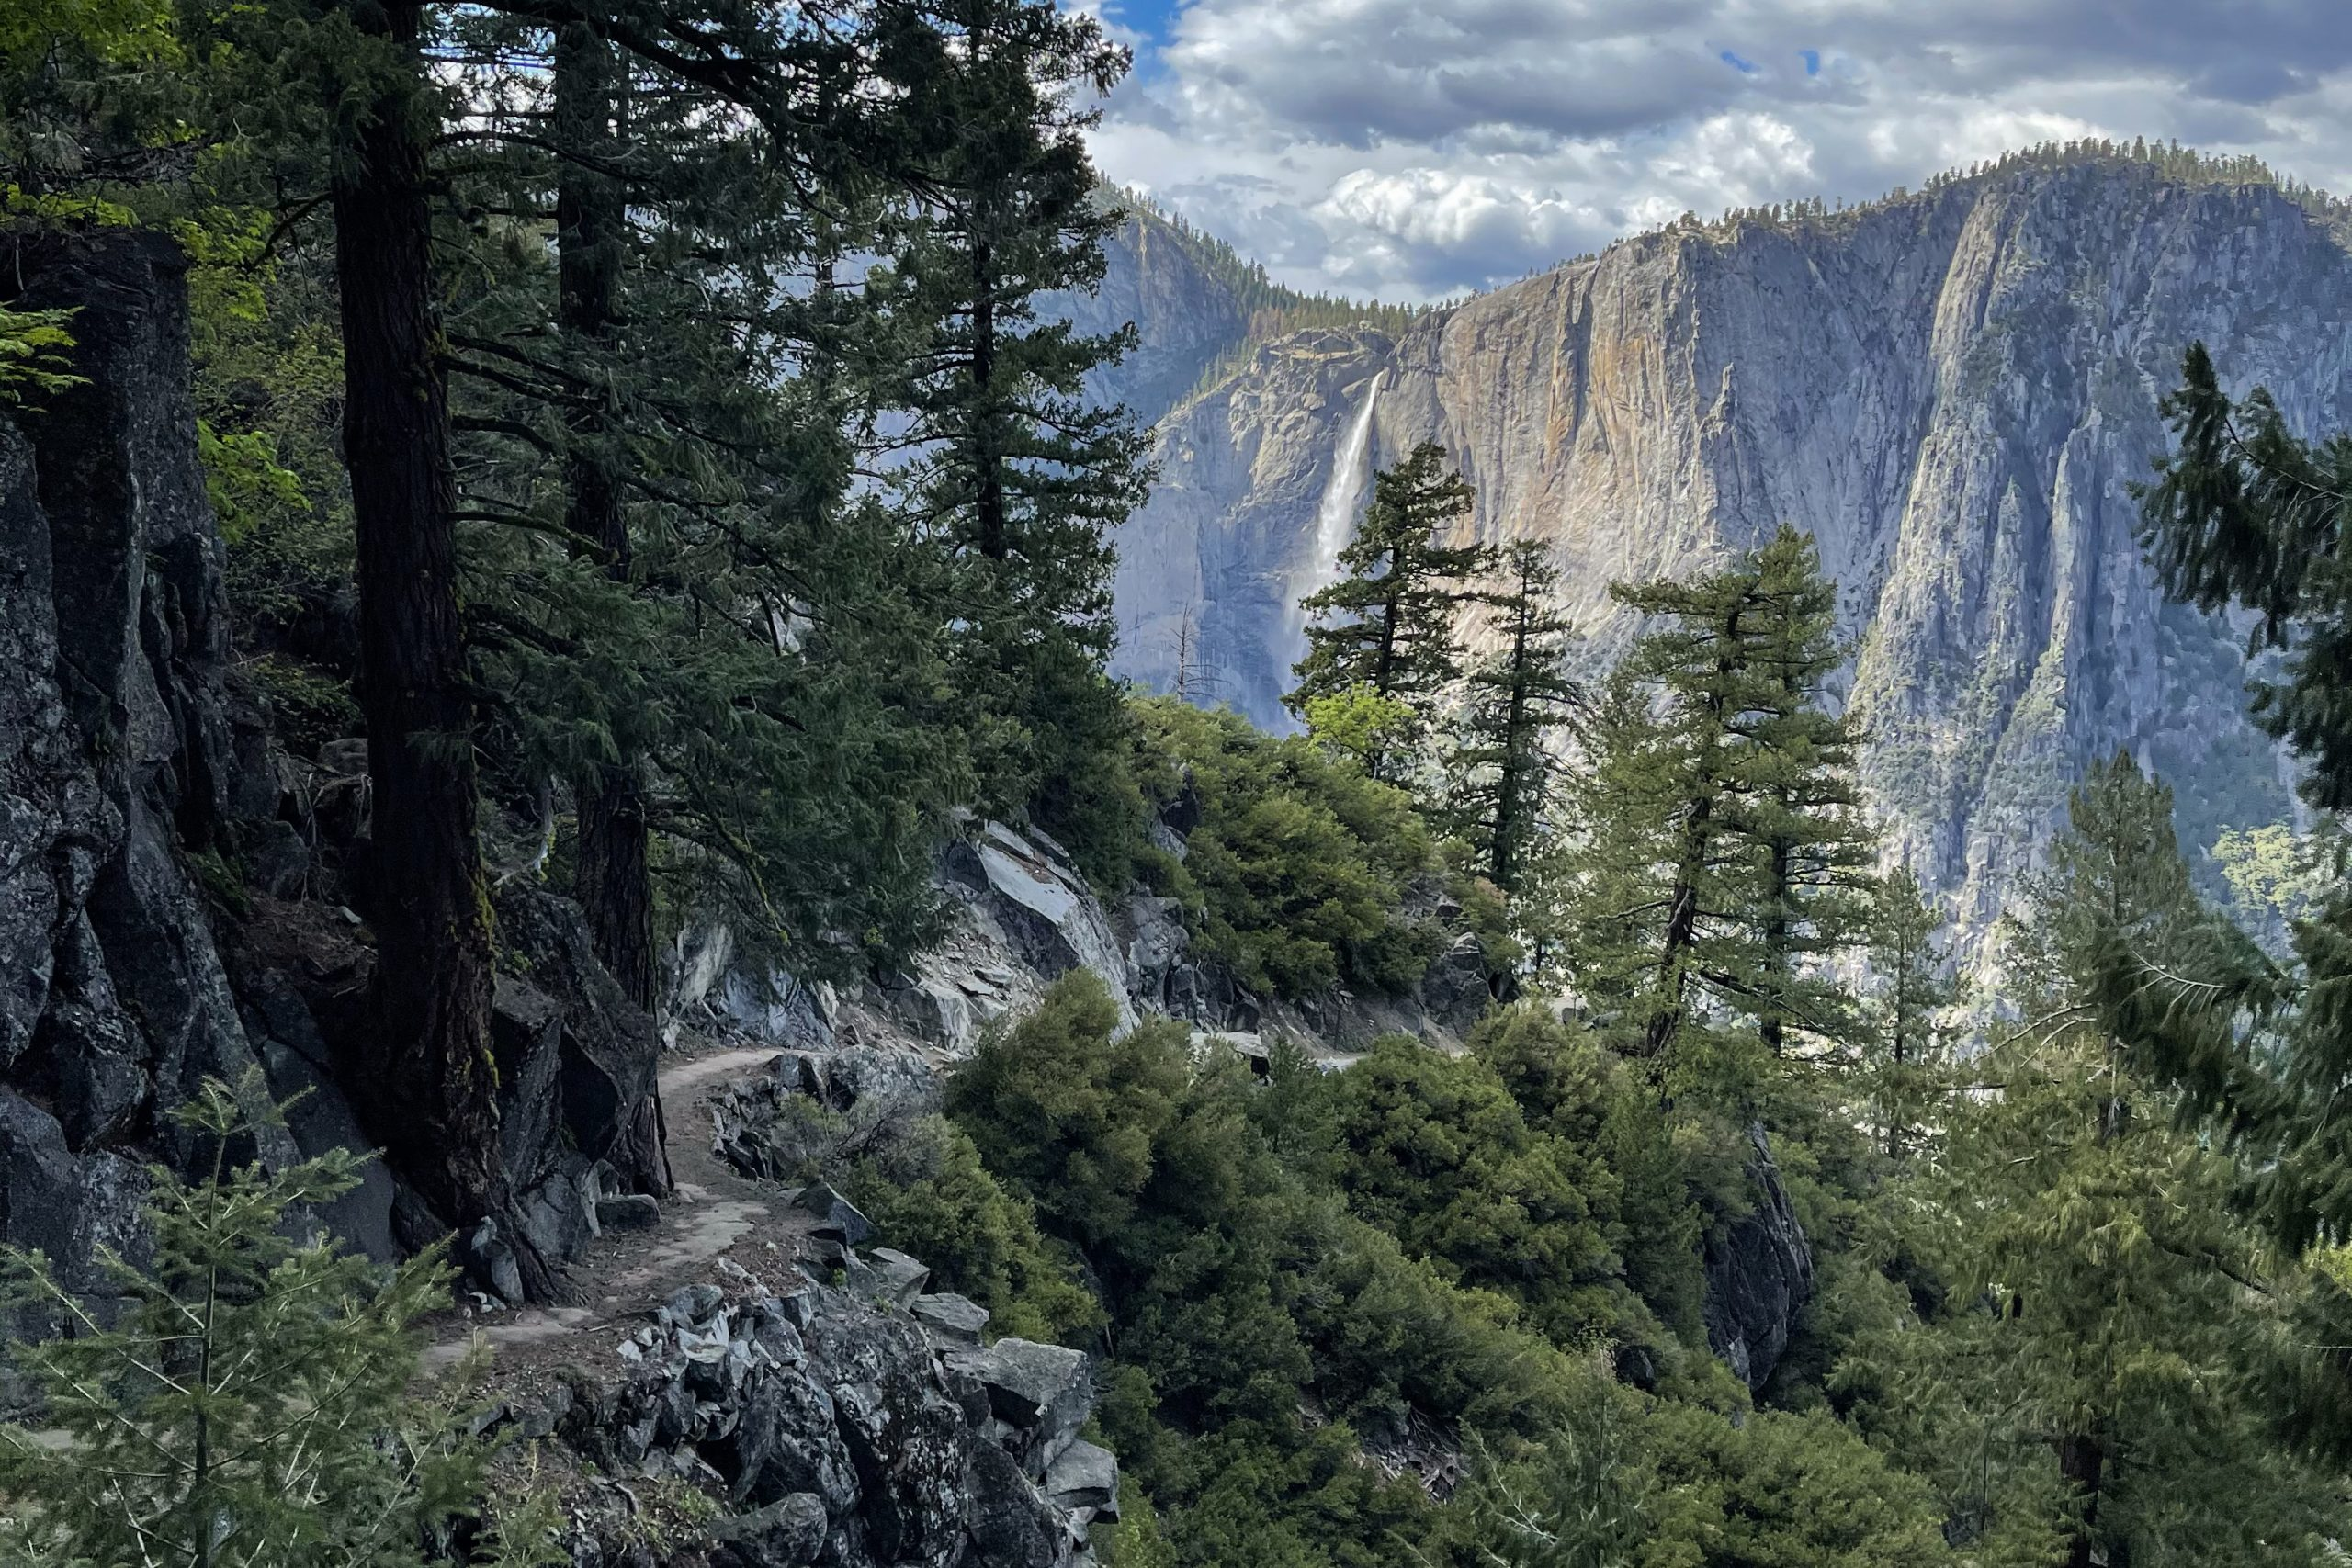 Hiking the Four Mile Trail | Yosemite National Park